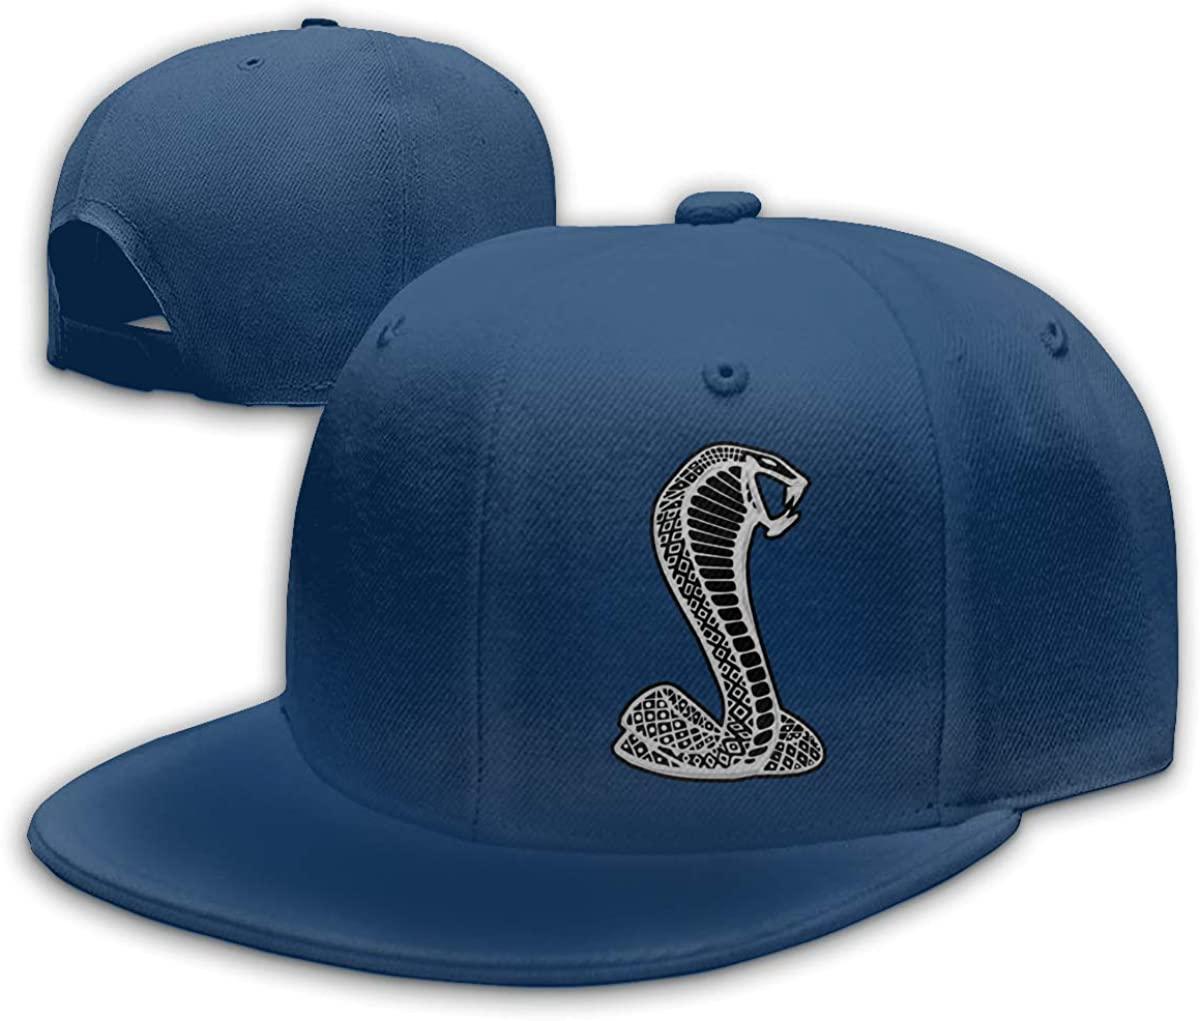 FOECBIR Snake Snapback Flat Baseball Cap Men's Adjustable